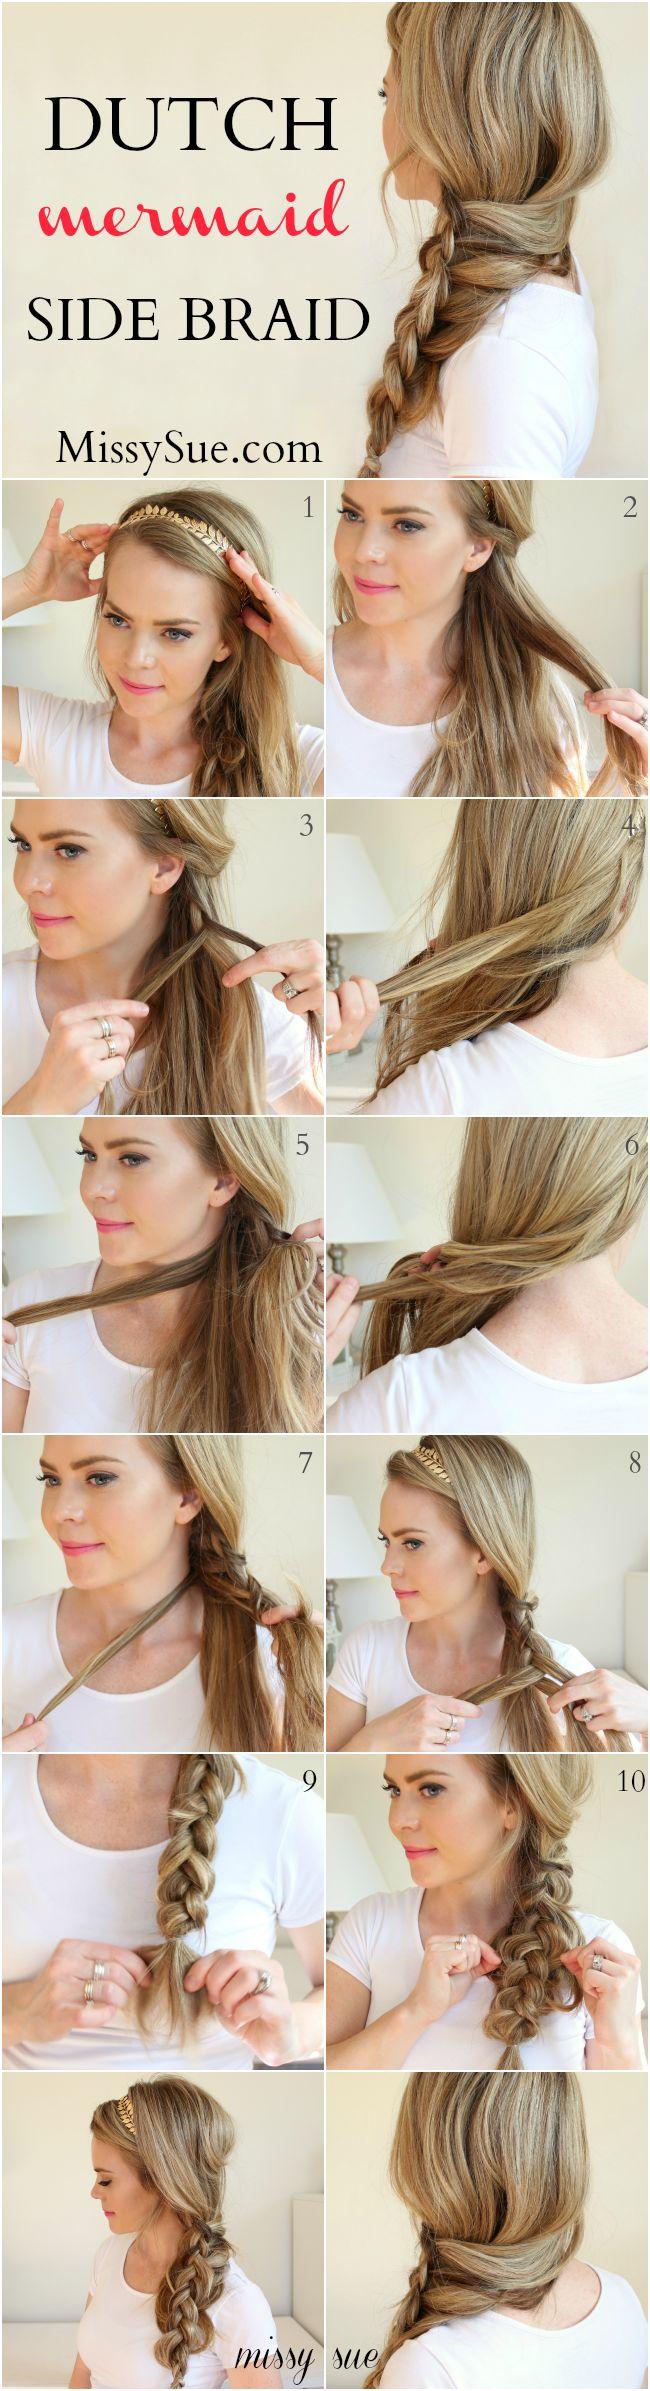 Groovy 1000 Ideas About Mermaid Braid Tutorials On Pinterest Hair Short Hairstyles For Black Women Fulllsitofus